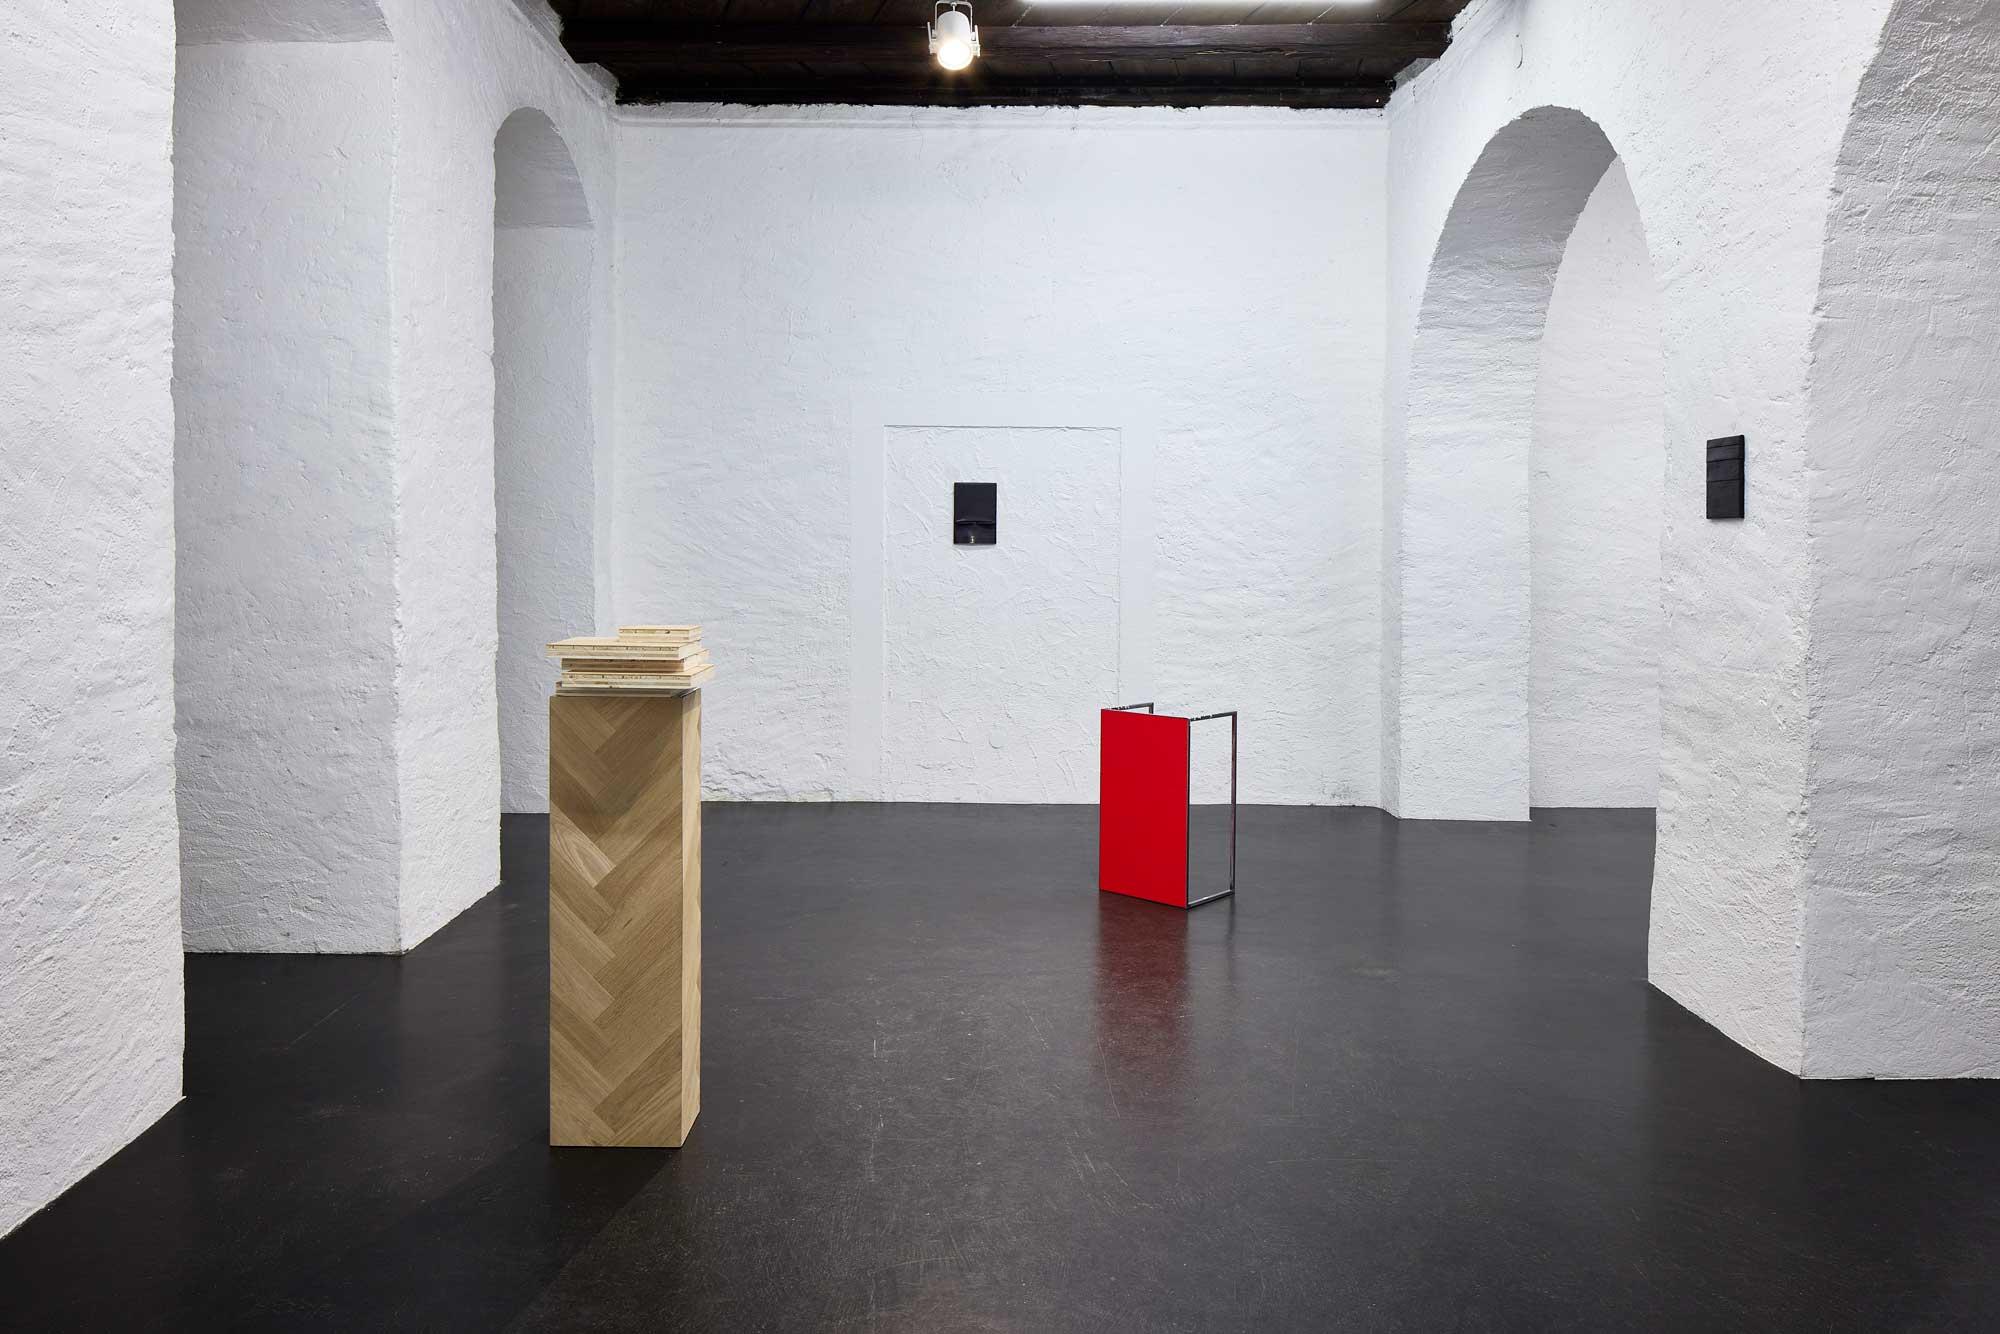 tears-of-tin_exhibition-view_LUKA-JANA-BERCHTOLD_21-03-10_002_Angela-Lamprecht